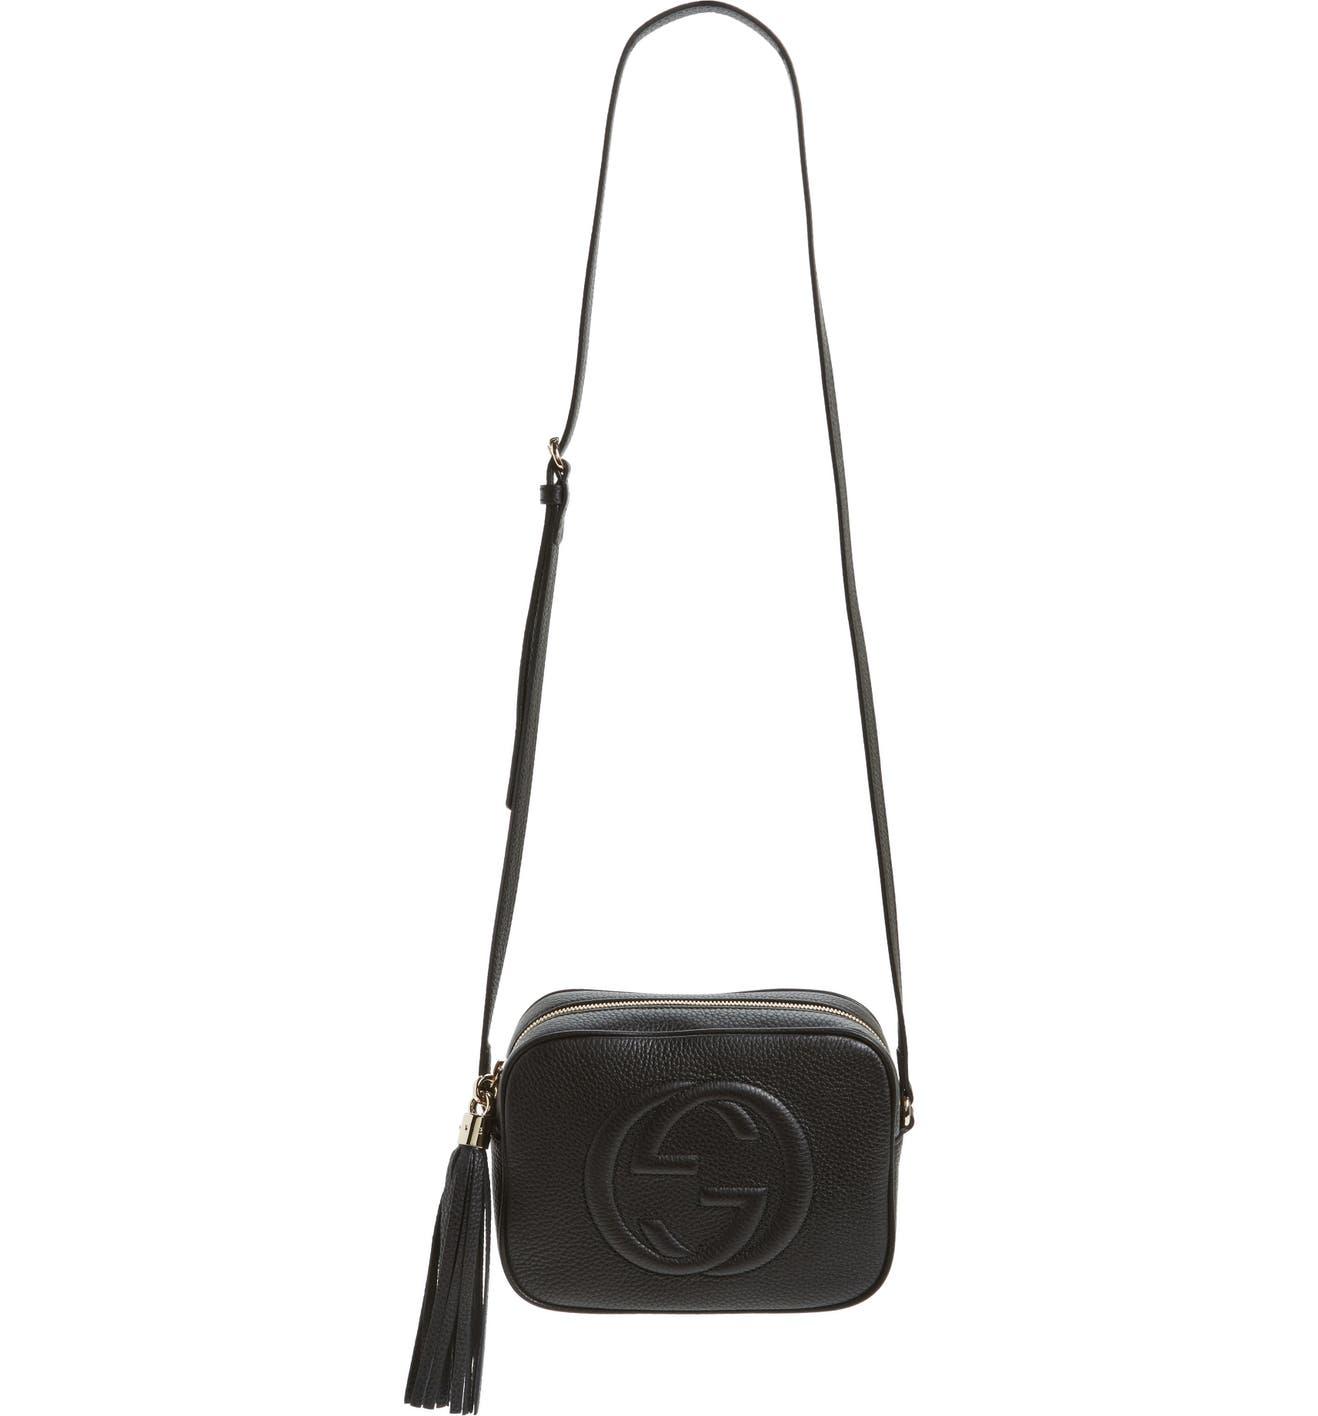 783f5ec0a Gucci Soho Disco Leather Bag   Nordstrom